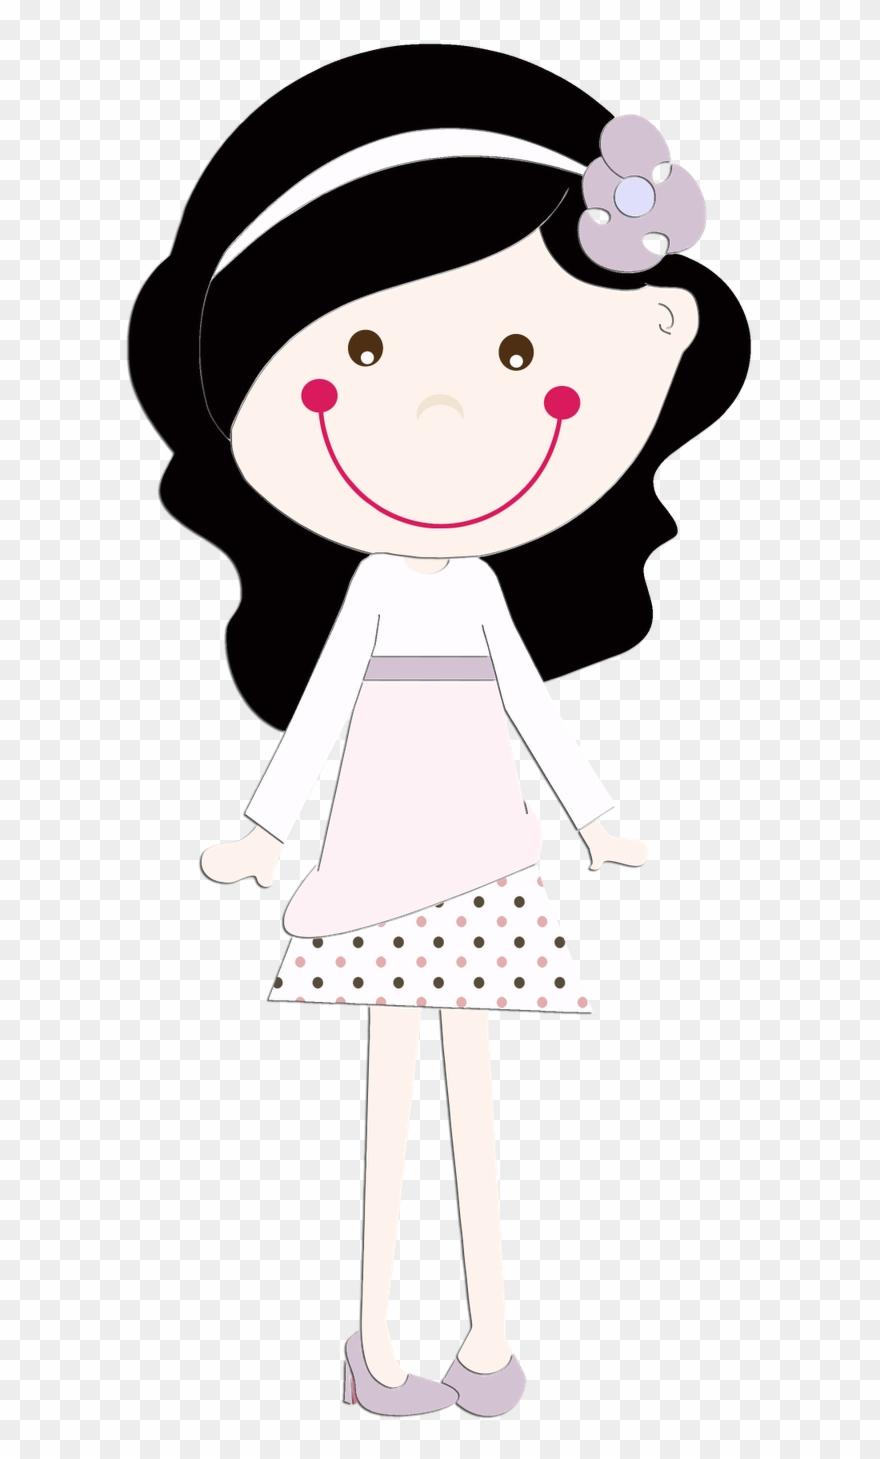 Bonecas & Meninas Family Clipart, Clipart Boy, Cute.